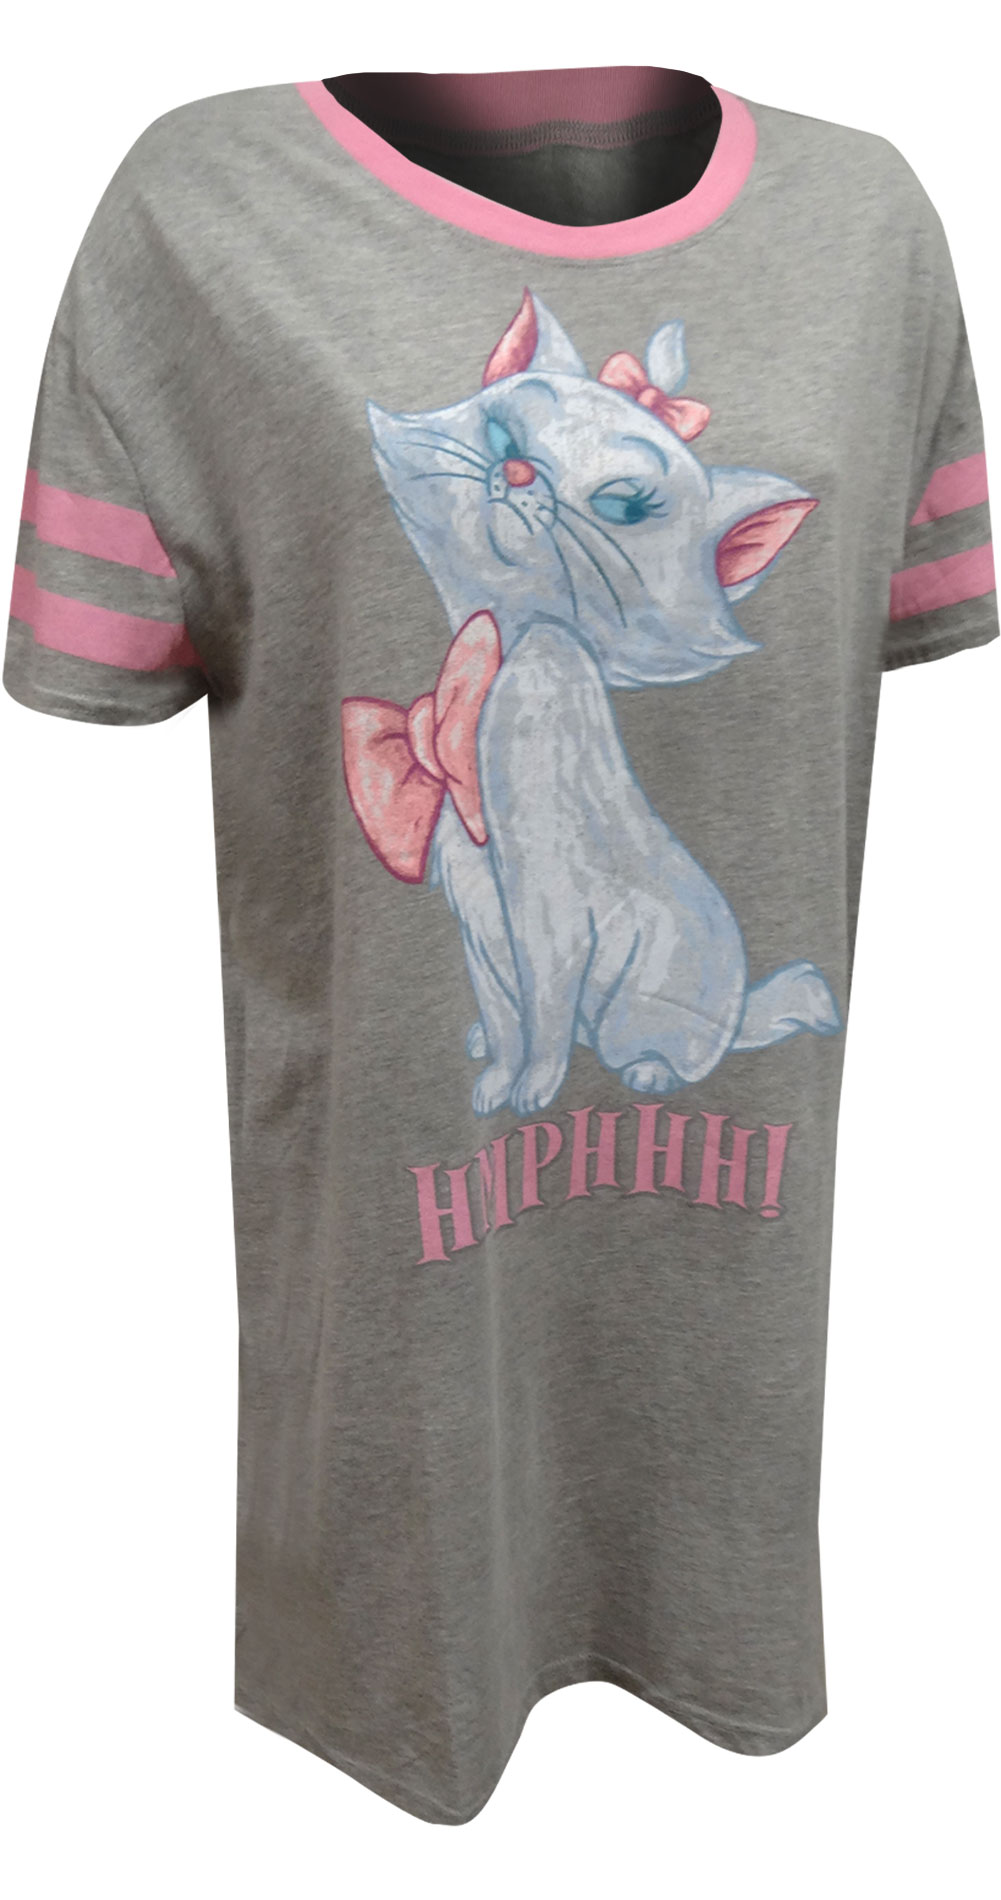 Image of Disney's Aristocats Marie Hmphhh Nightshirt for women